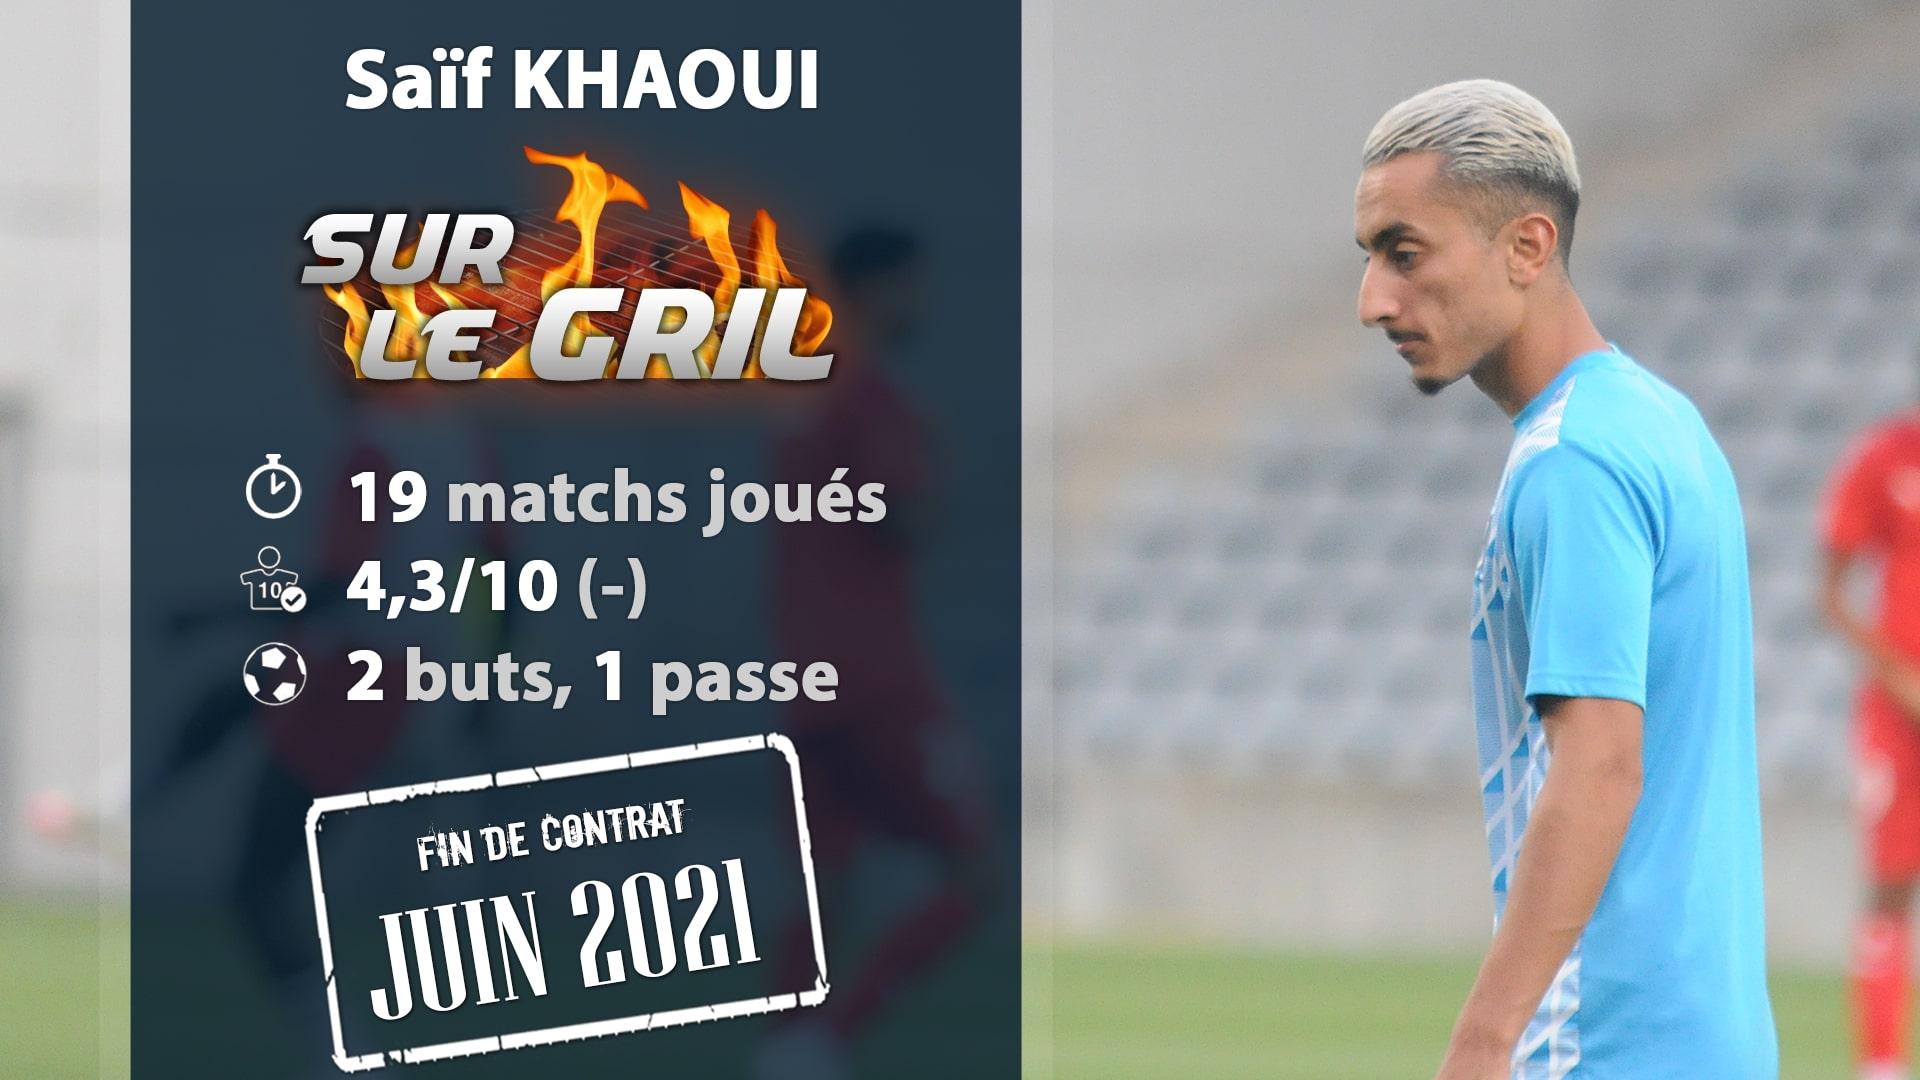 210524_khaoui_gril.jpg (198 KB)